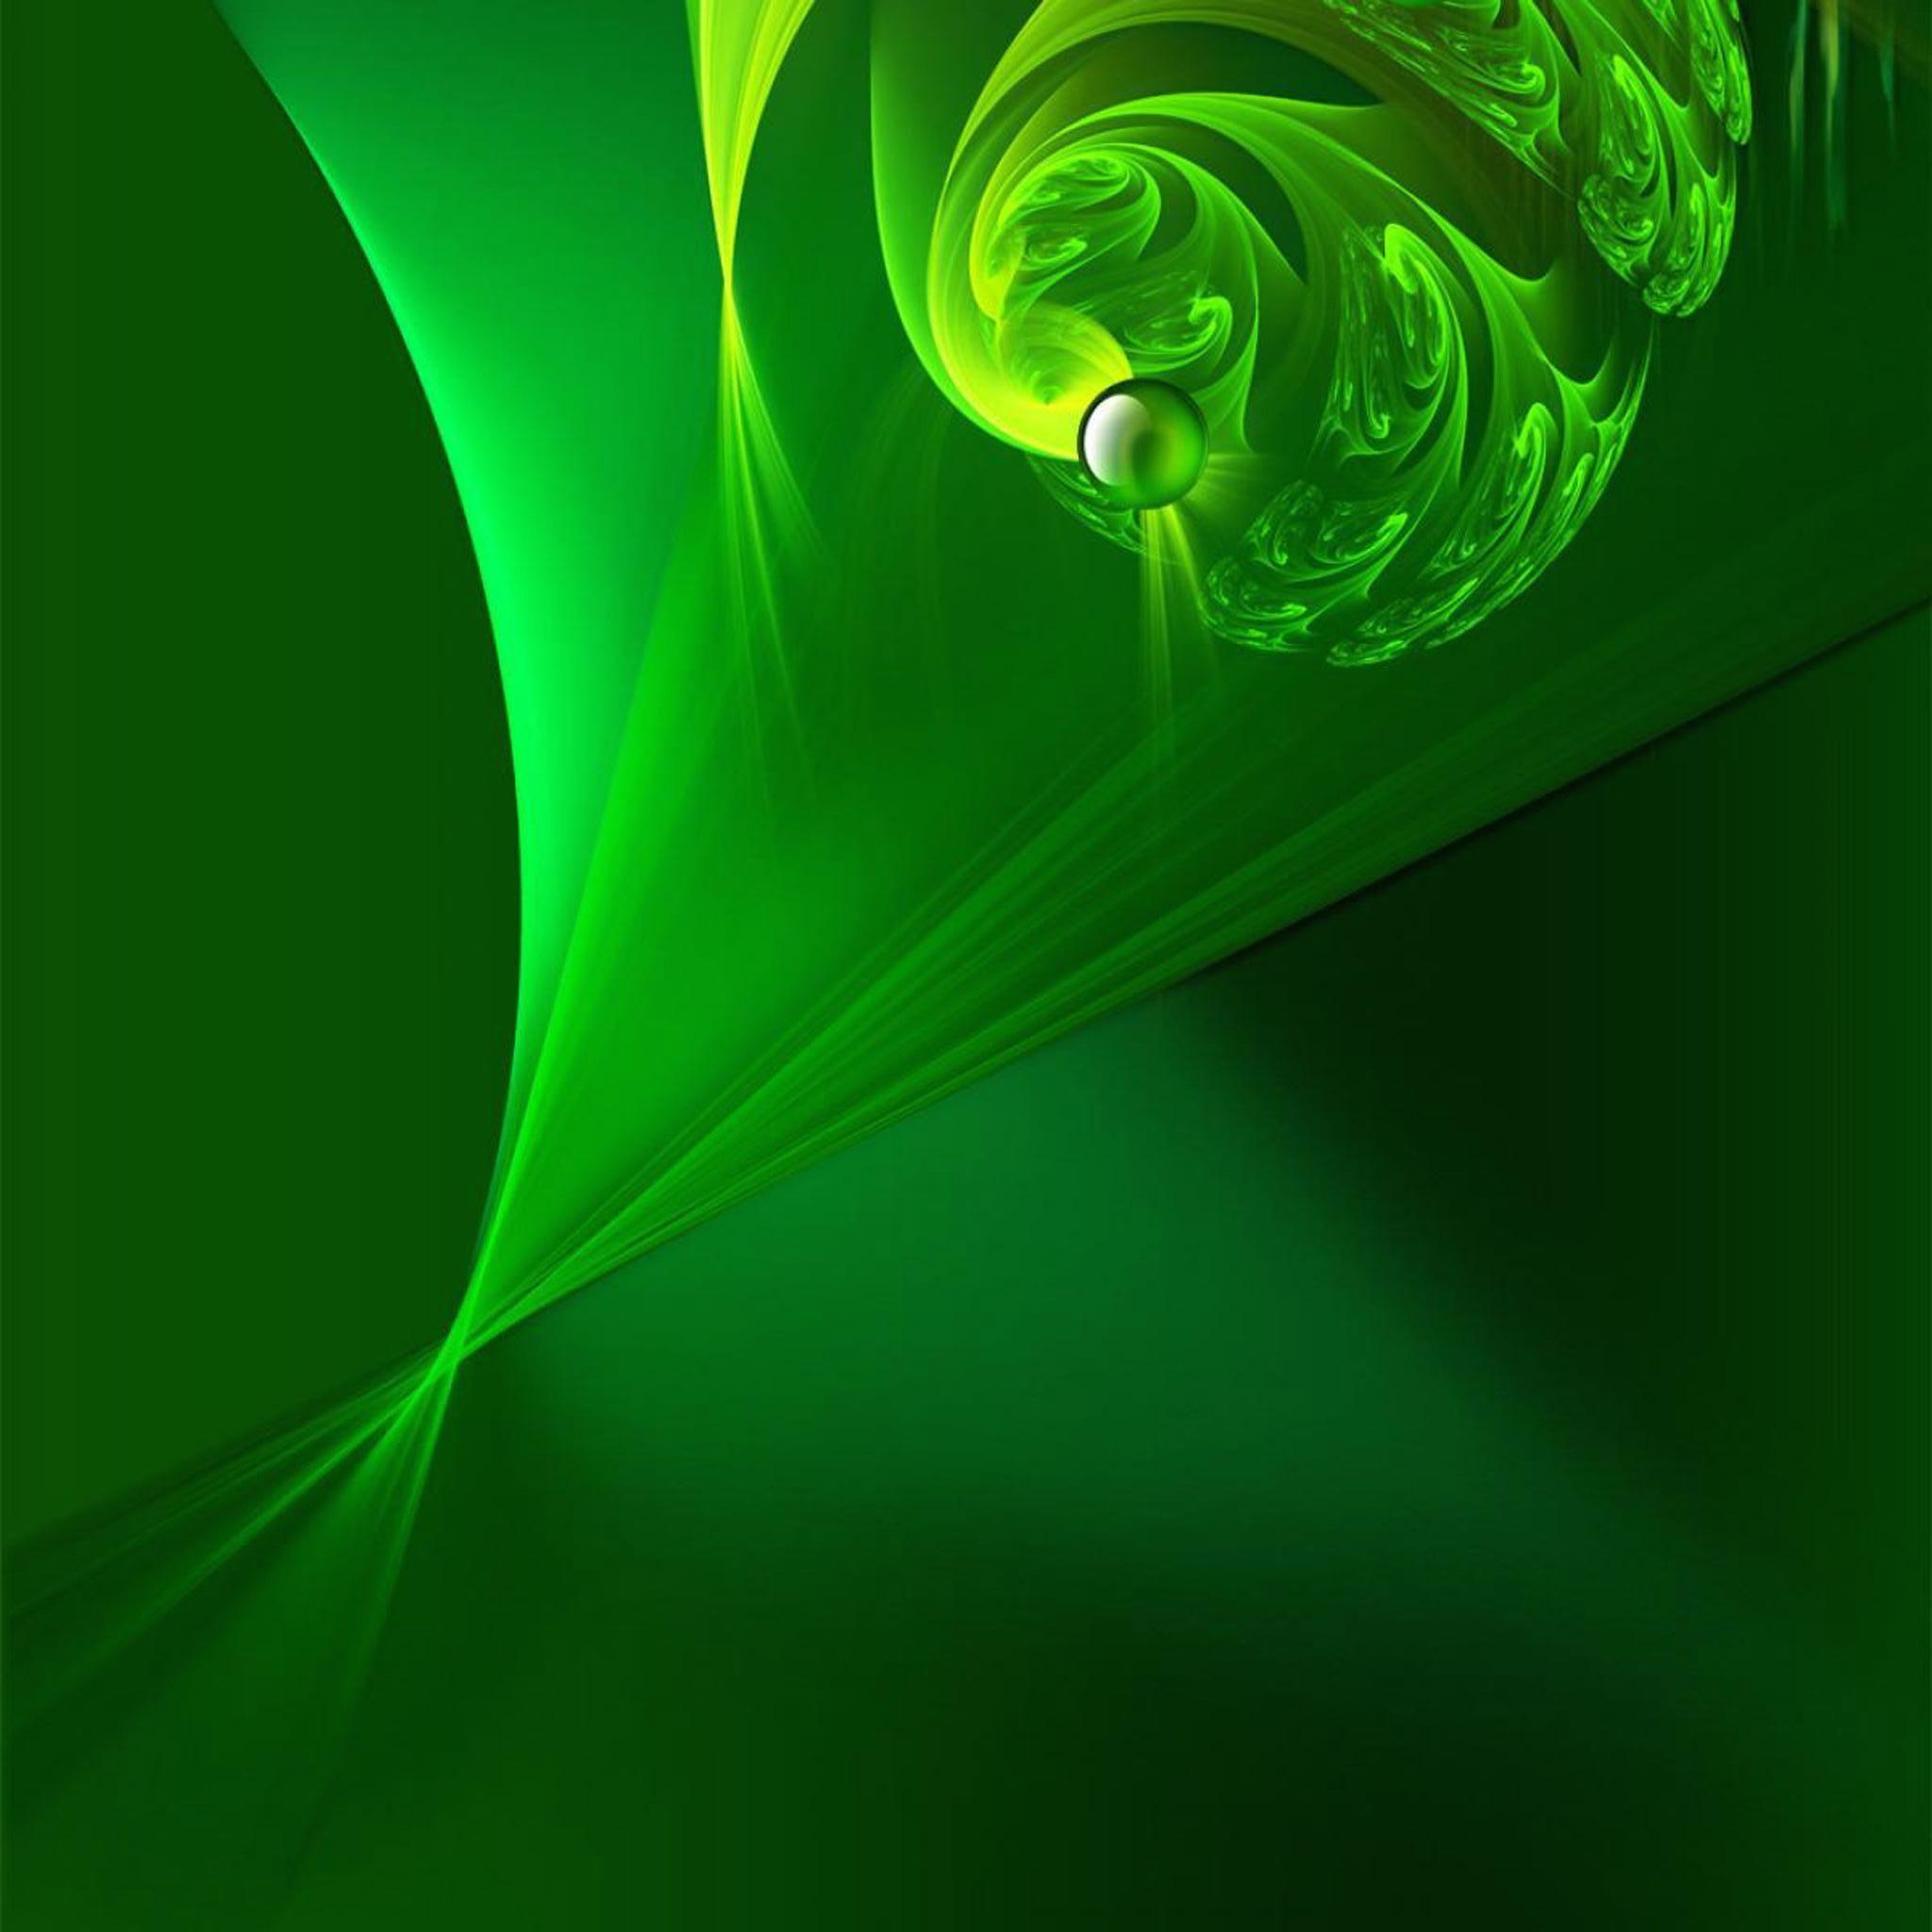 Iphone Wallpaper Abstract: Green Liquid #Abstract #digital #art #iPad Air #Wallpaper